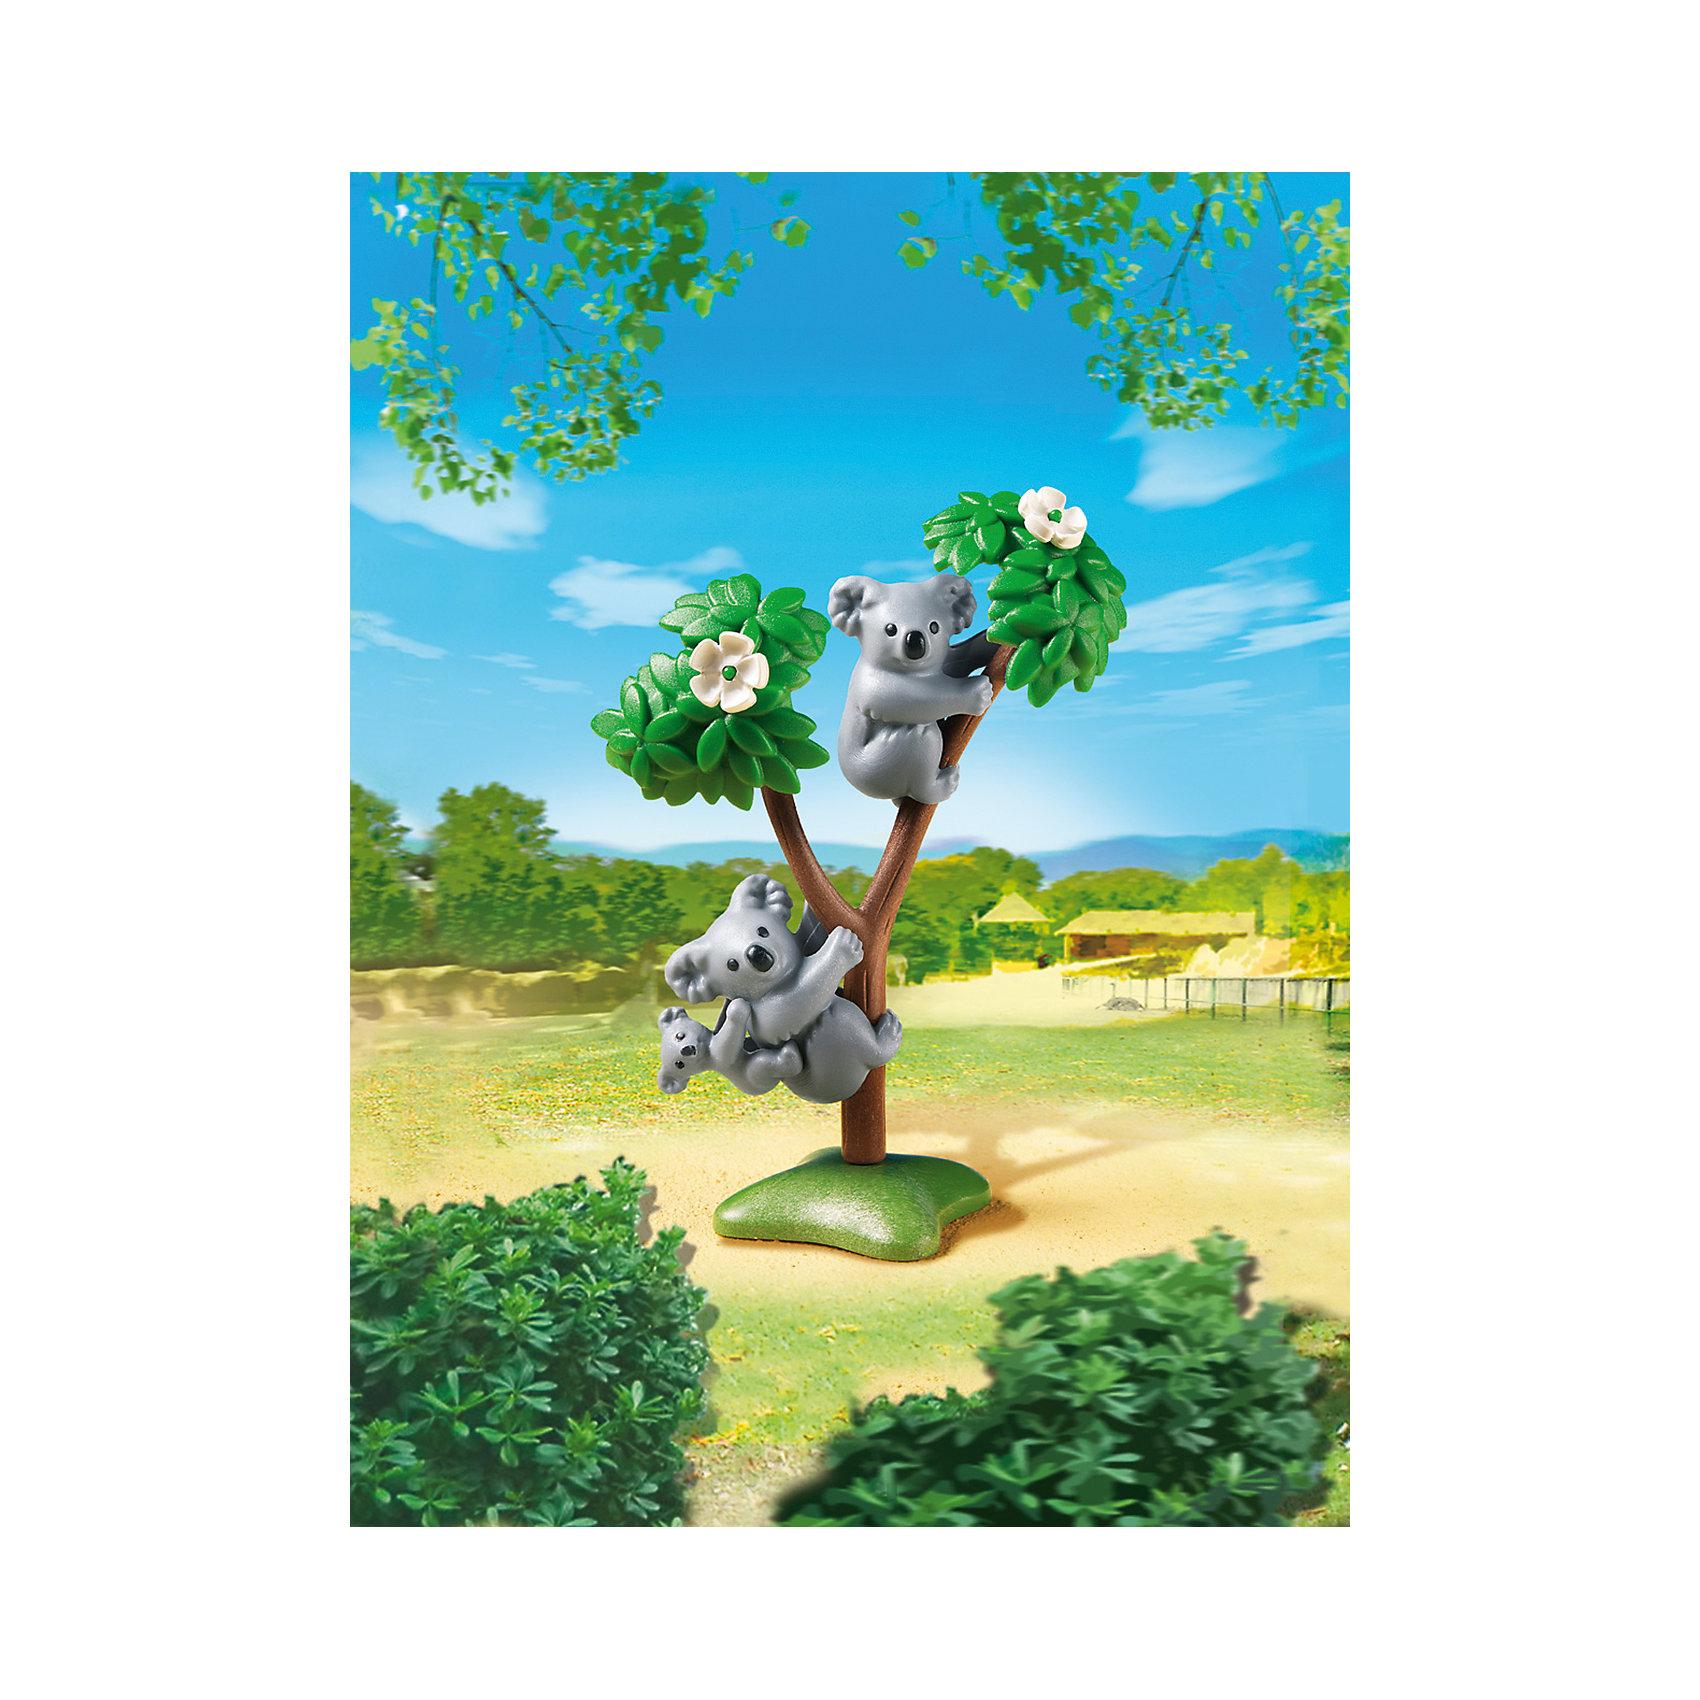 PLAYMOBIL® Зоопарк: Семья Коал, PLAYMOBIL фигурки игрушки playmobil зоопарк стая фламинго